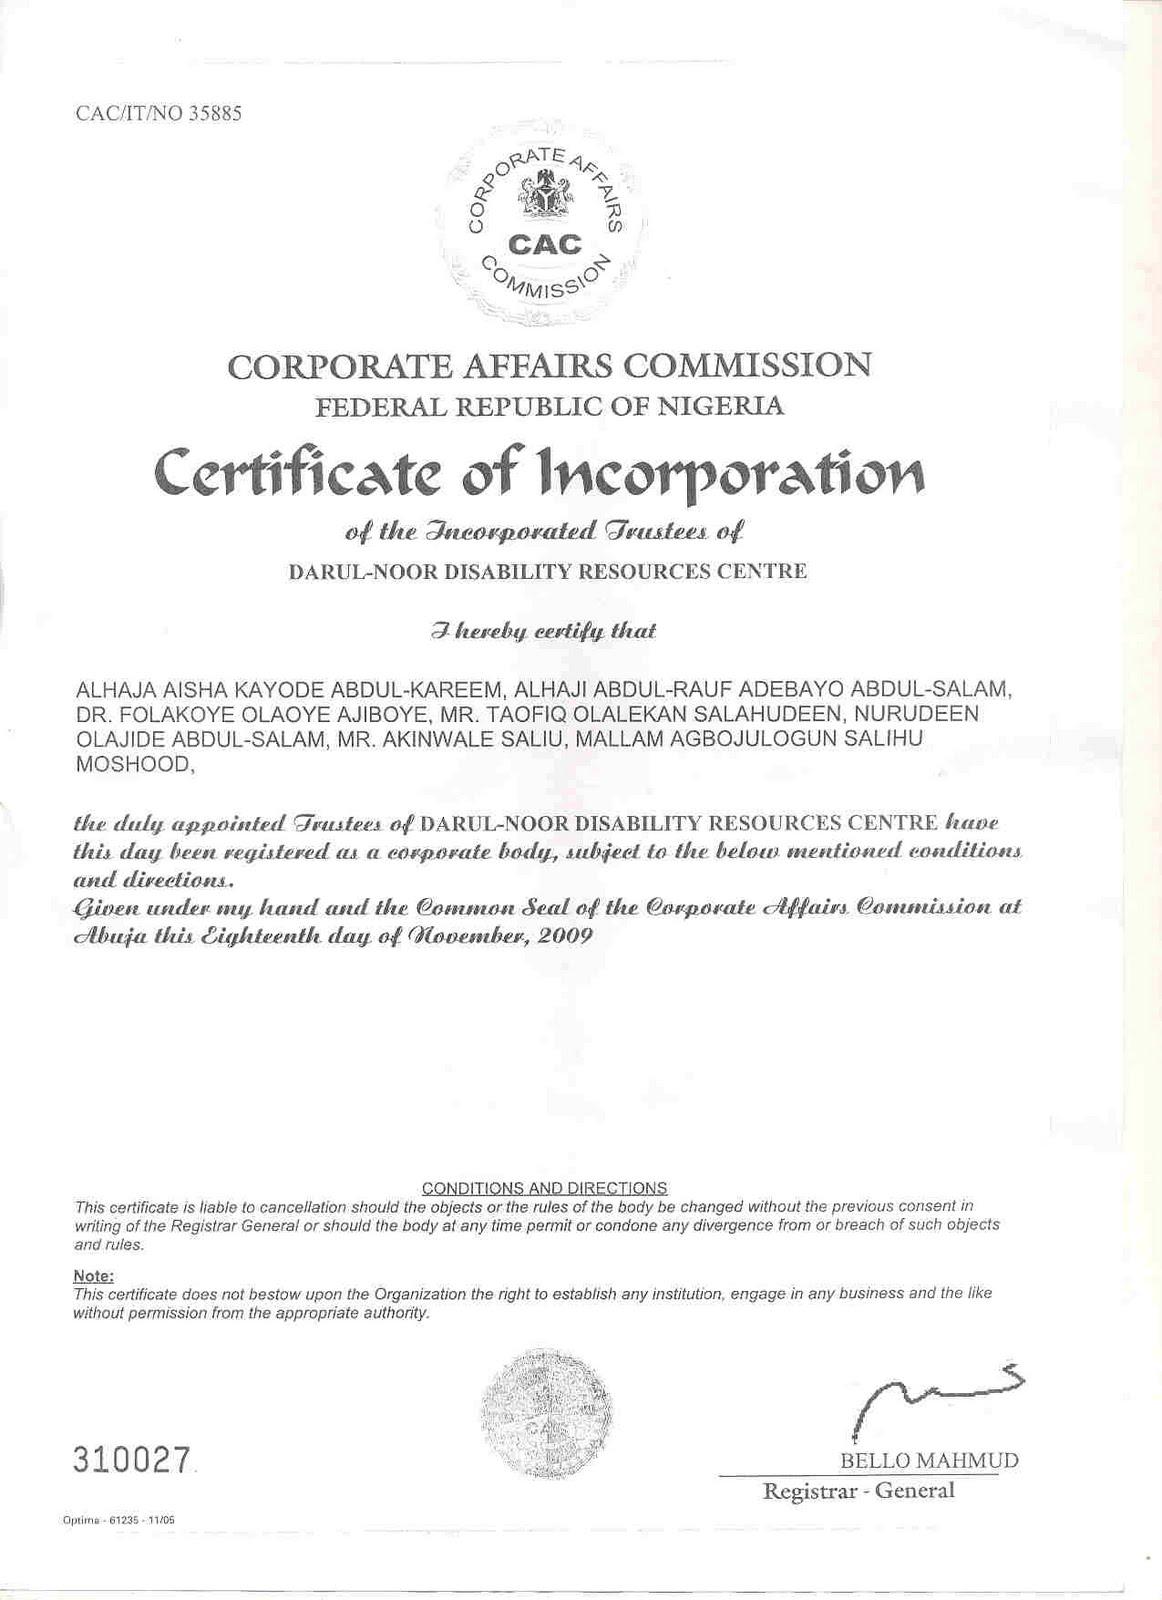 Darul Noor Disability Resources Centre Nigeria Certificate Of